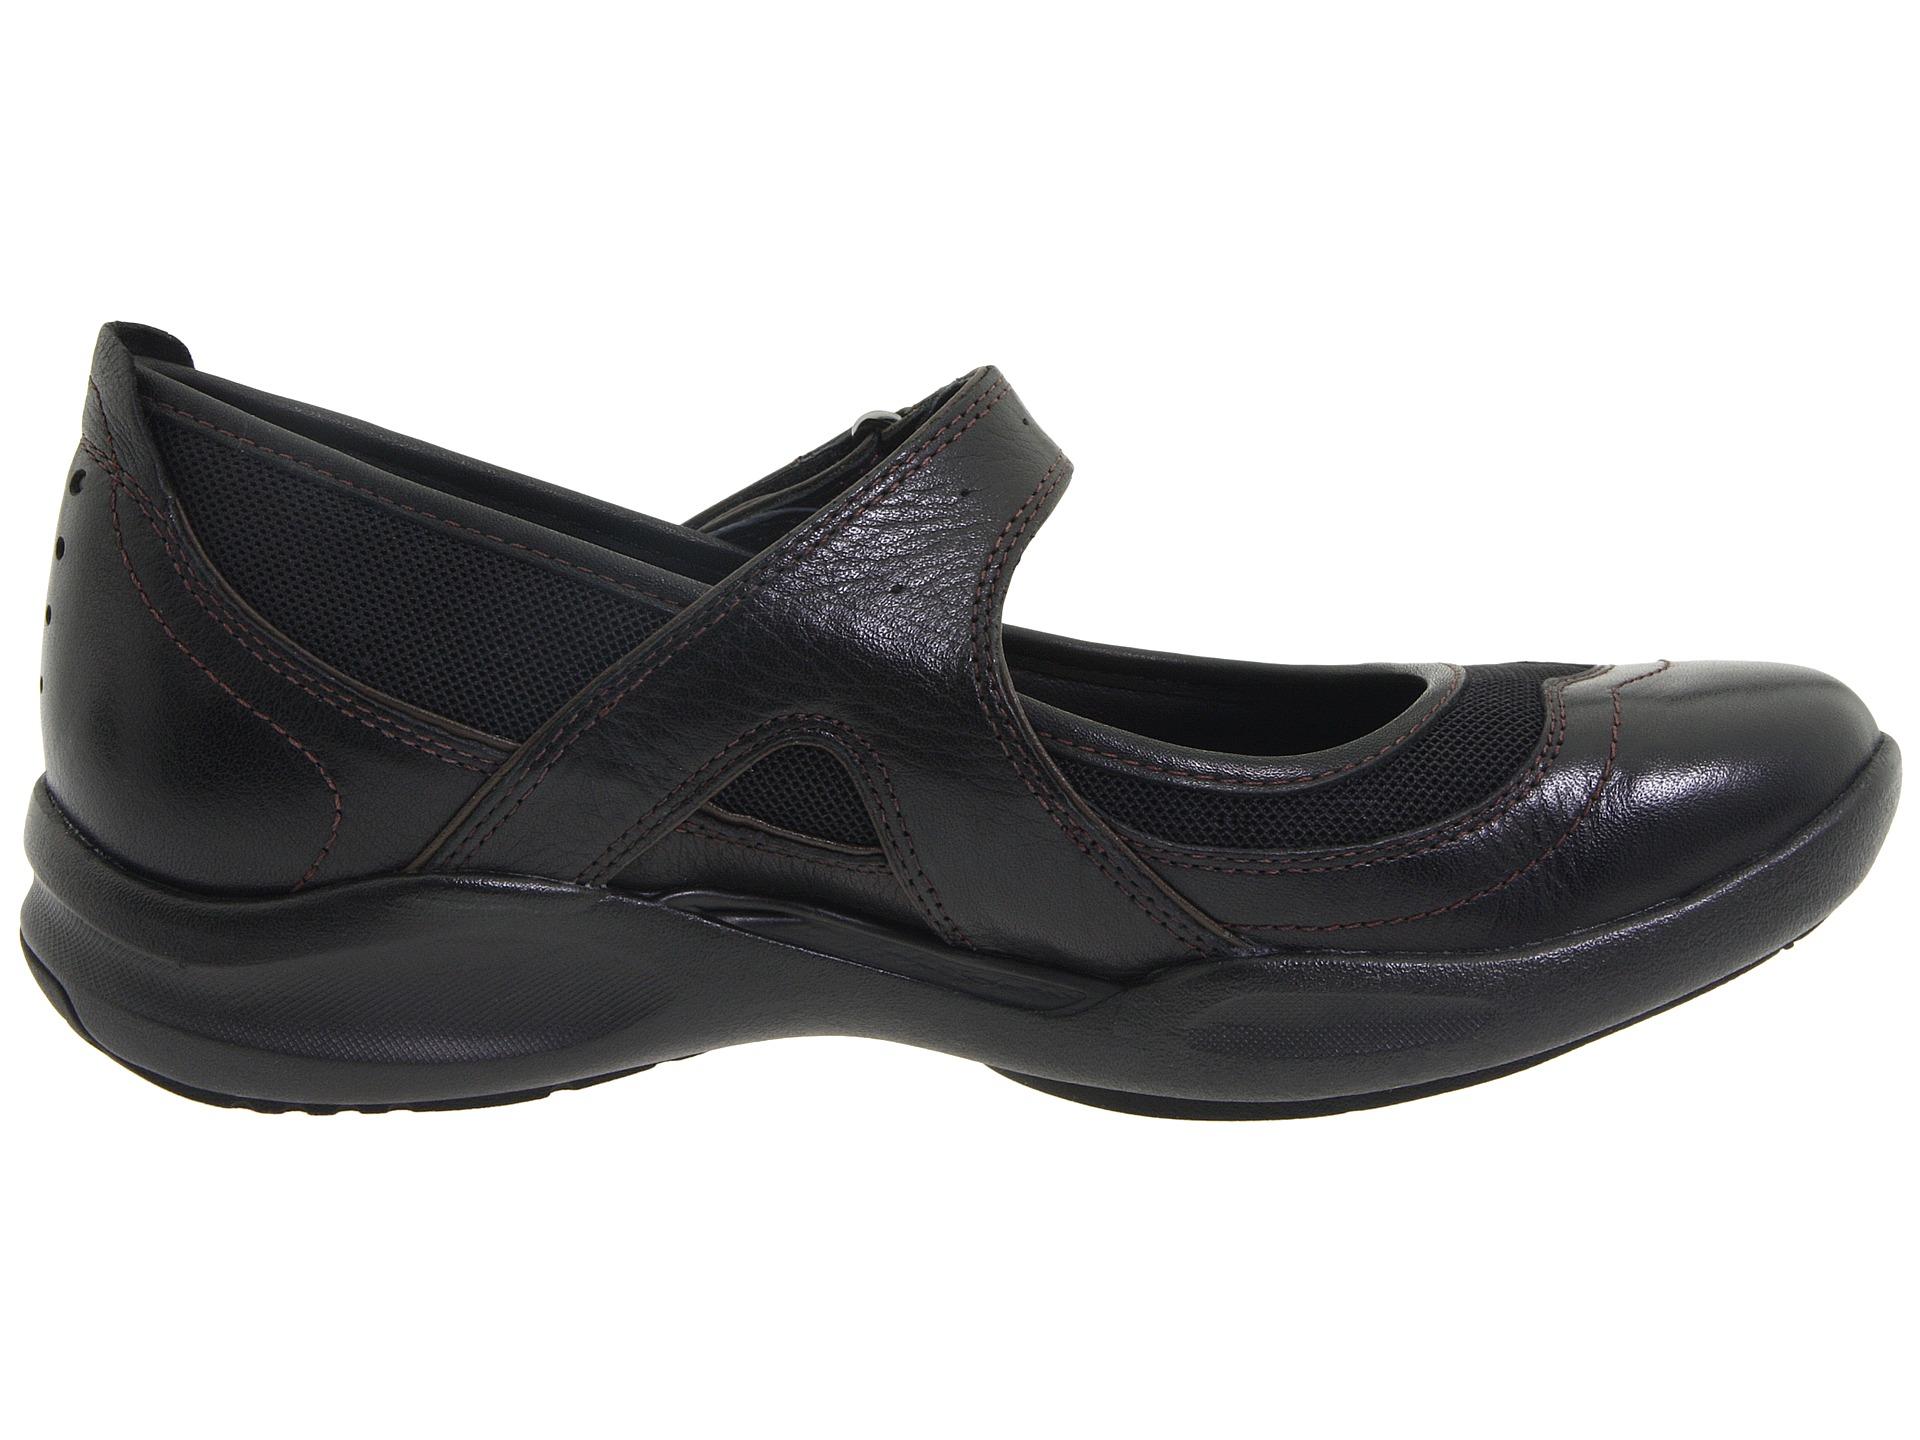 Clarks Womens Walking Shoes - FREE Shipping & Exchanges | Shoebuy.com